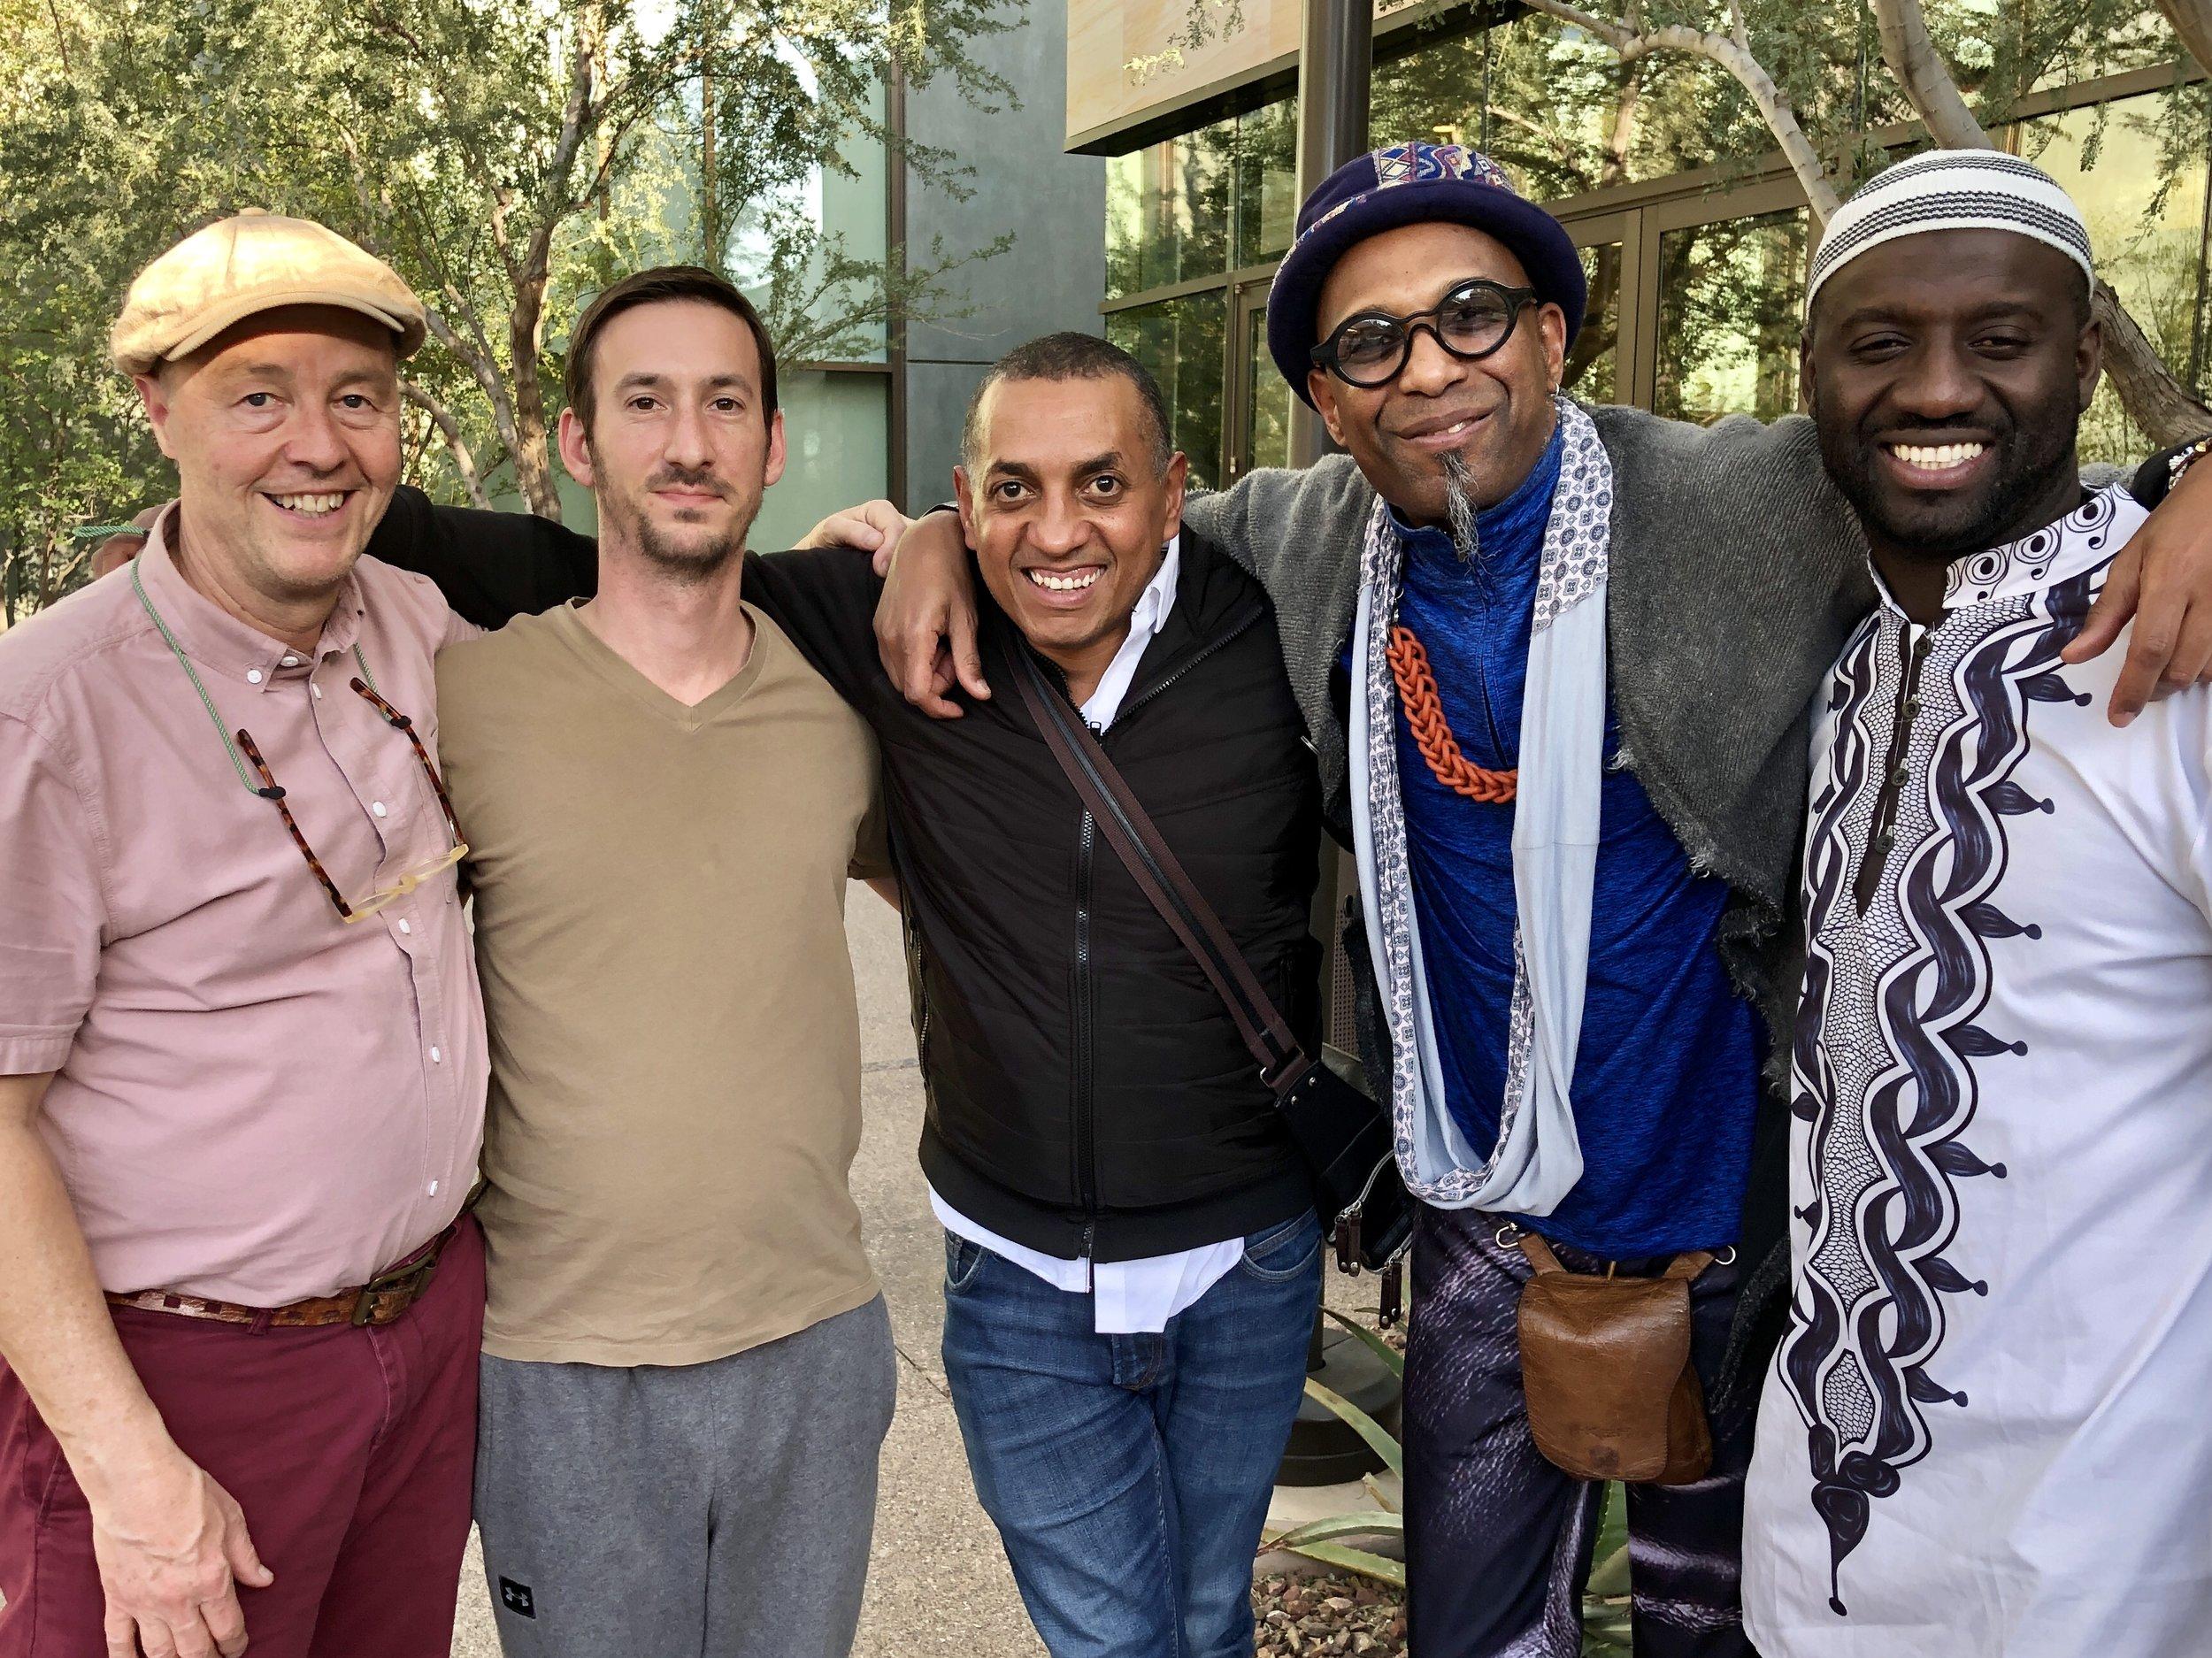 Scott Price (manager of Omar), Tyler, Gustavo, Omar, Seckou